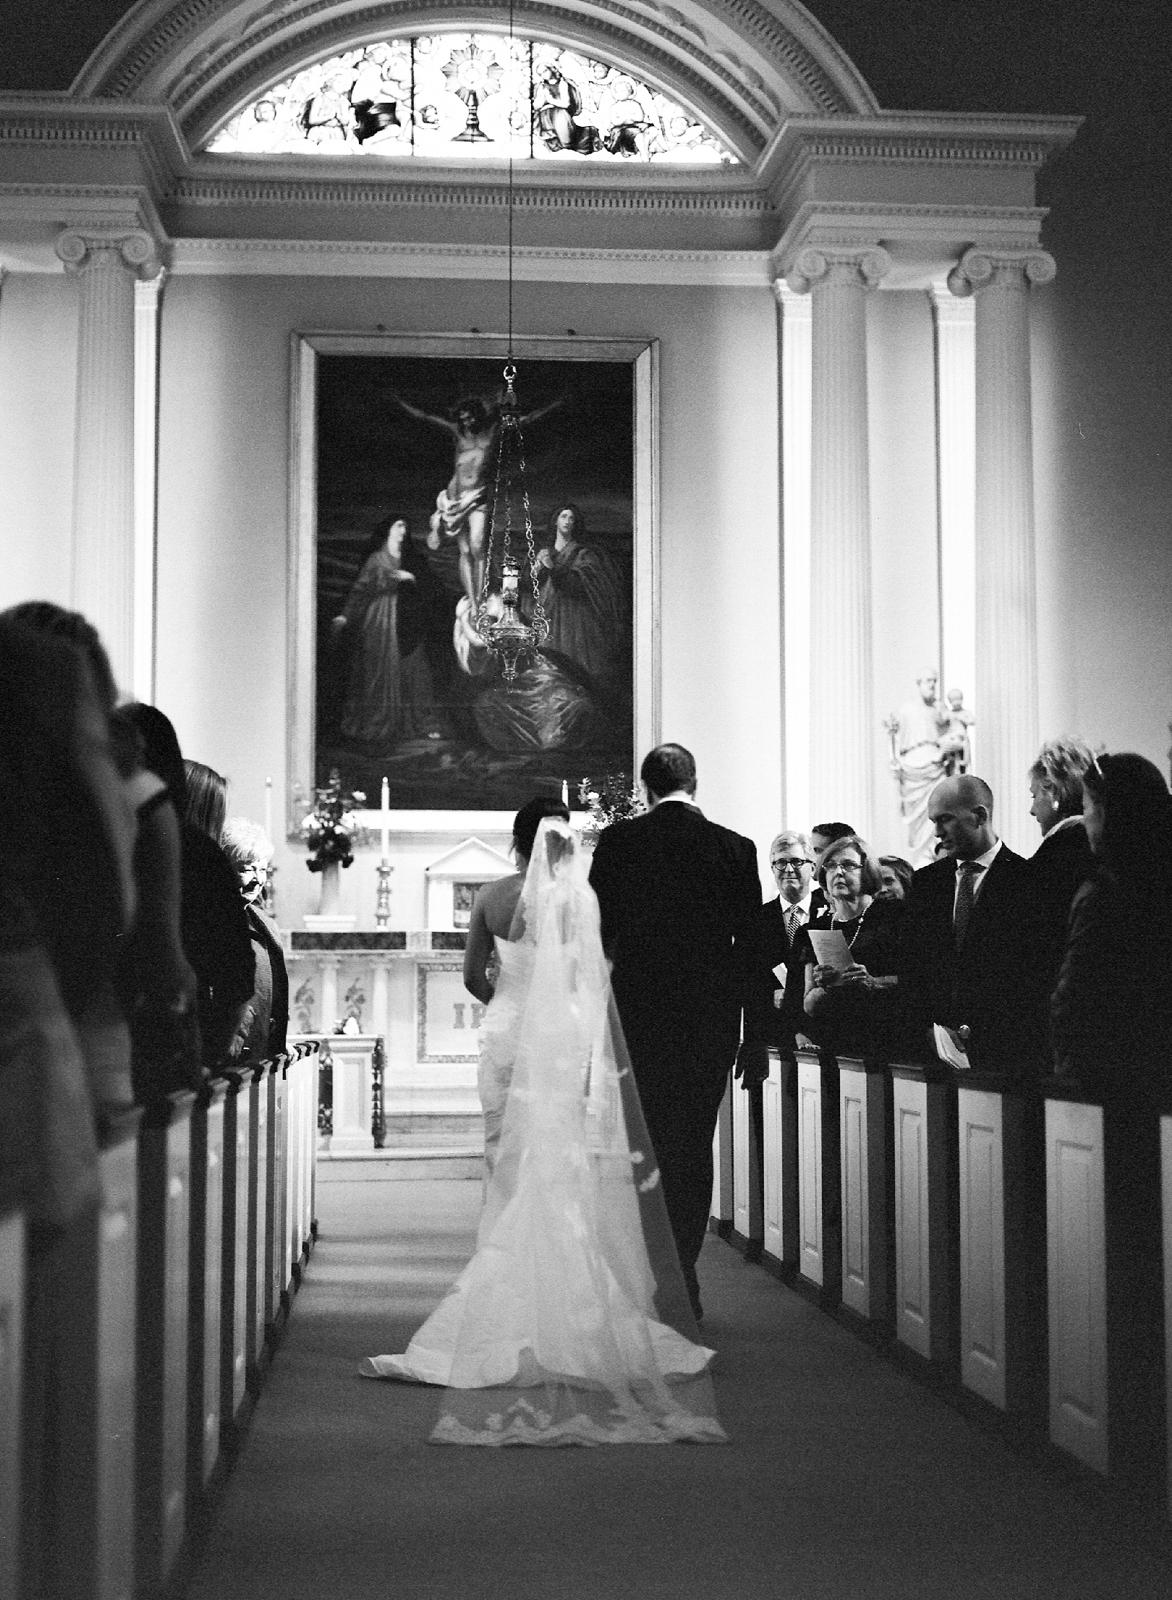 atrium at curtis center wedding photographer philadelphia wedding photographer shannon griffin_0014.jpg